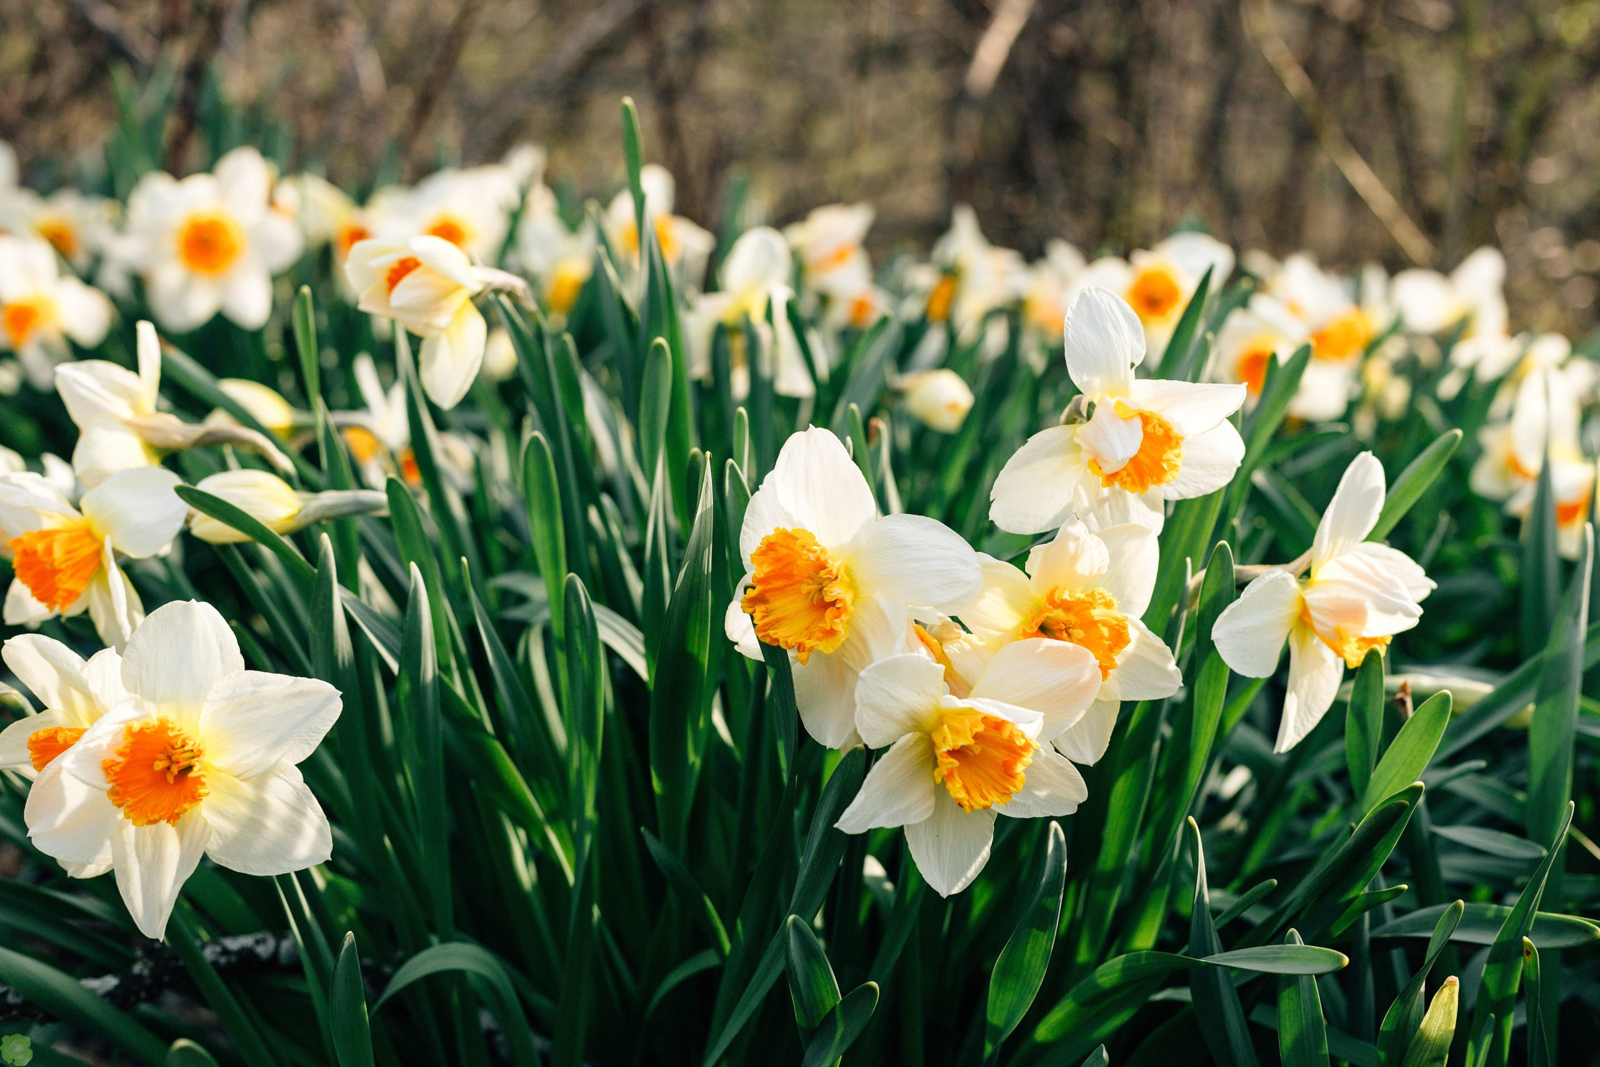 Осенняя посадка пропущена: весна без нарциссов?